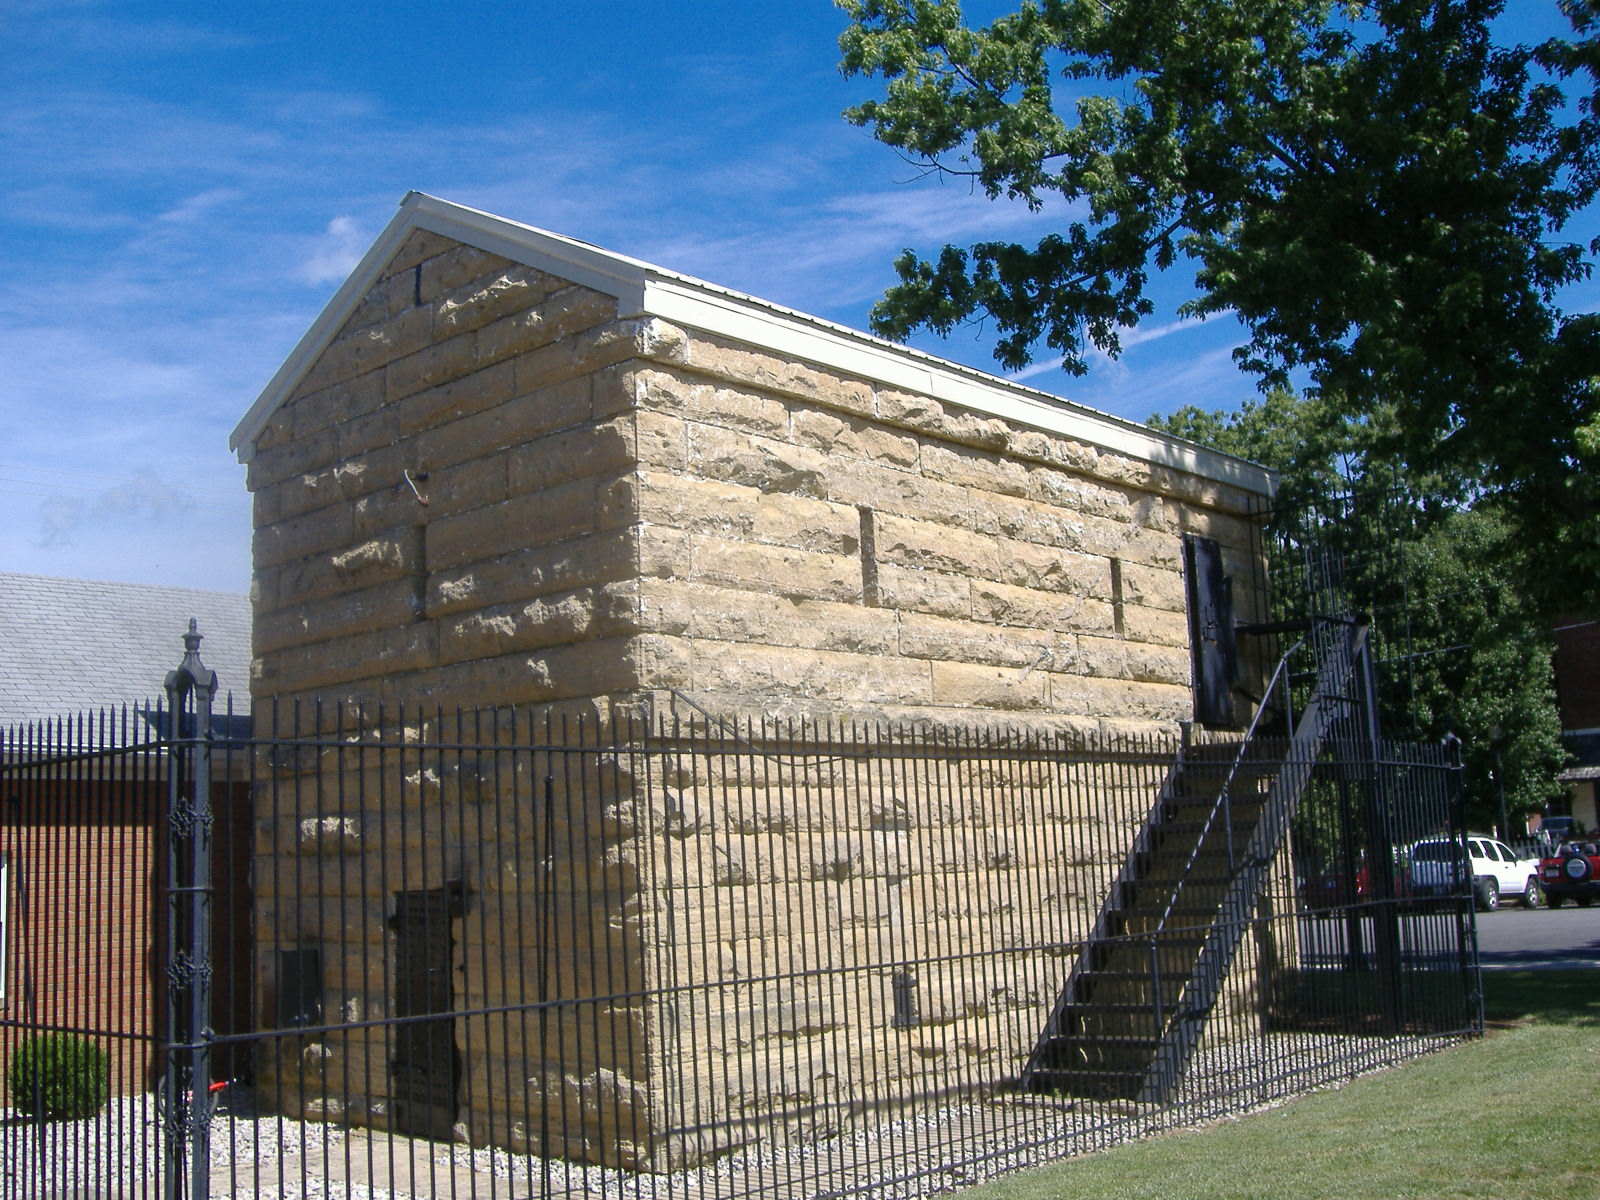 File:Old Bedford Jail JPG - Wikimedia Commons